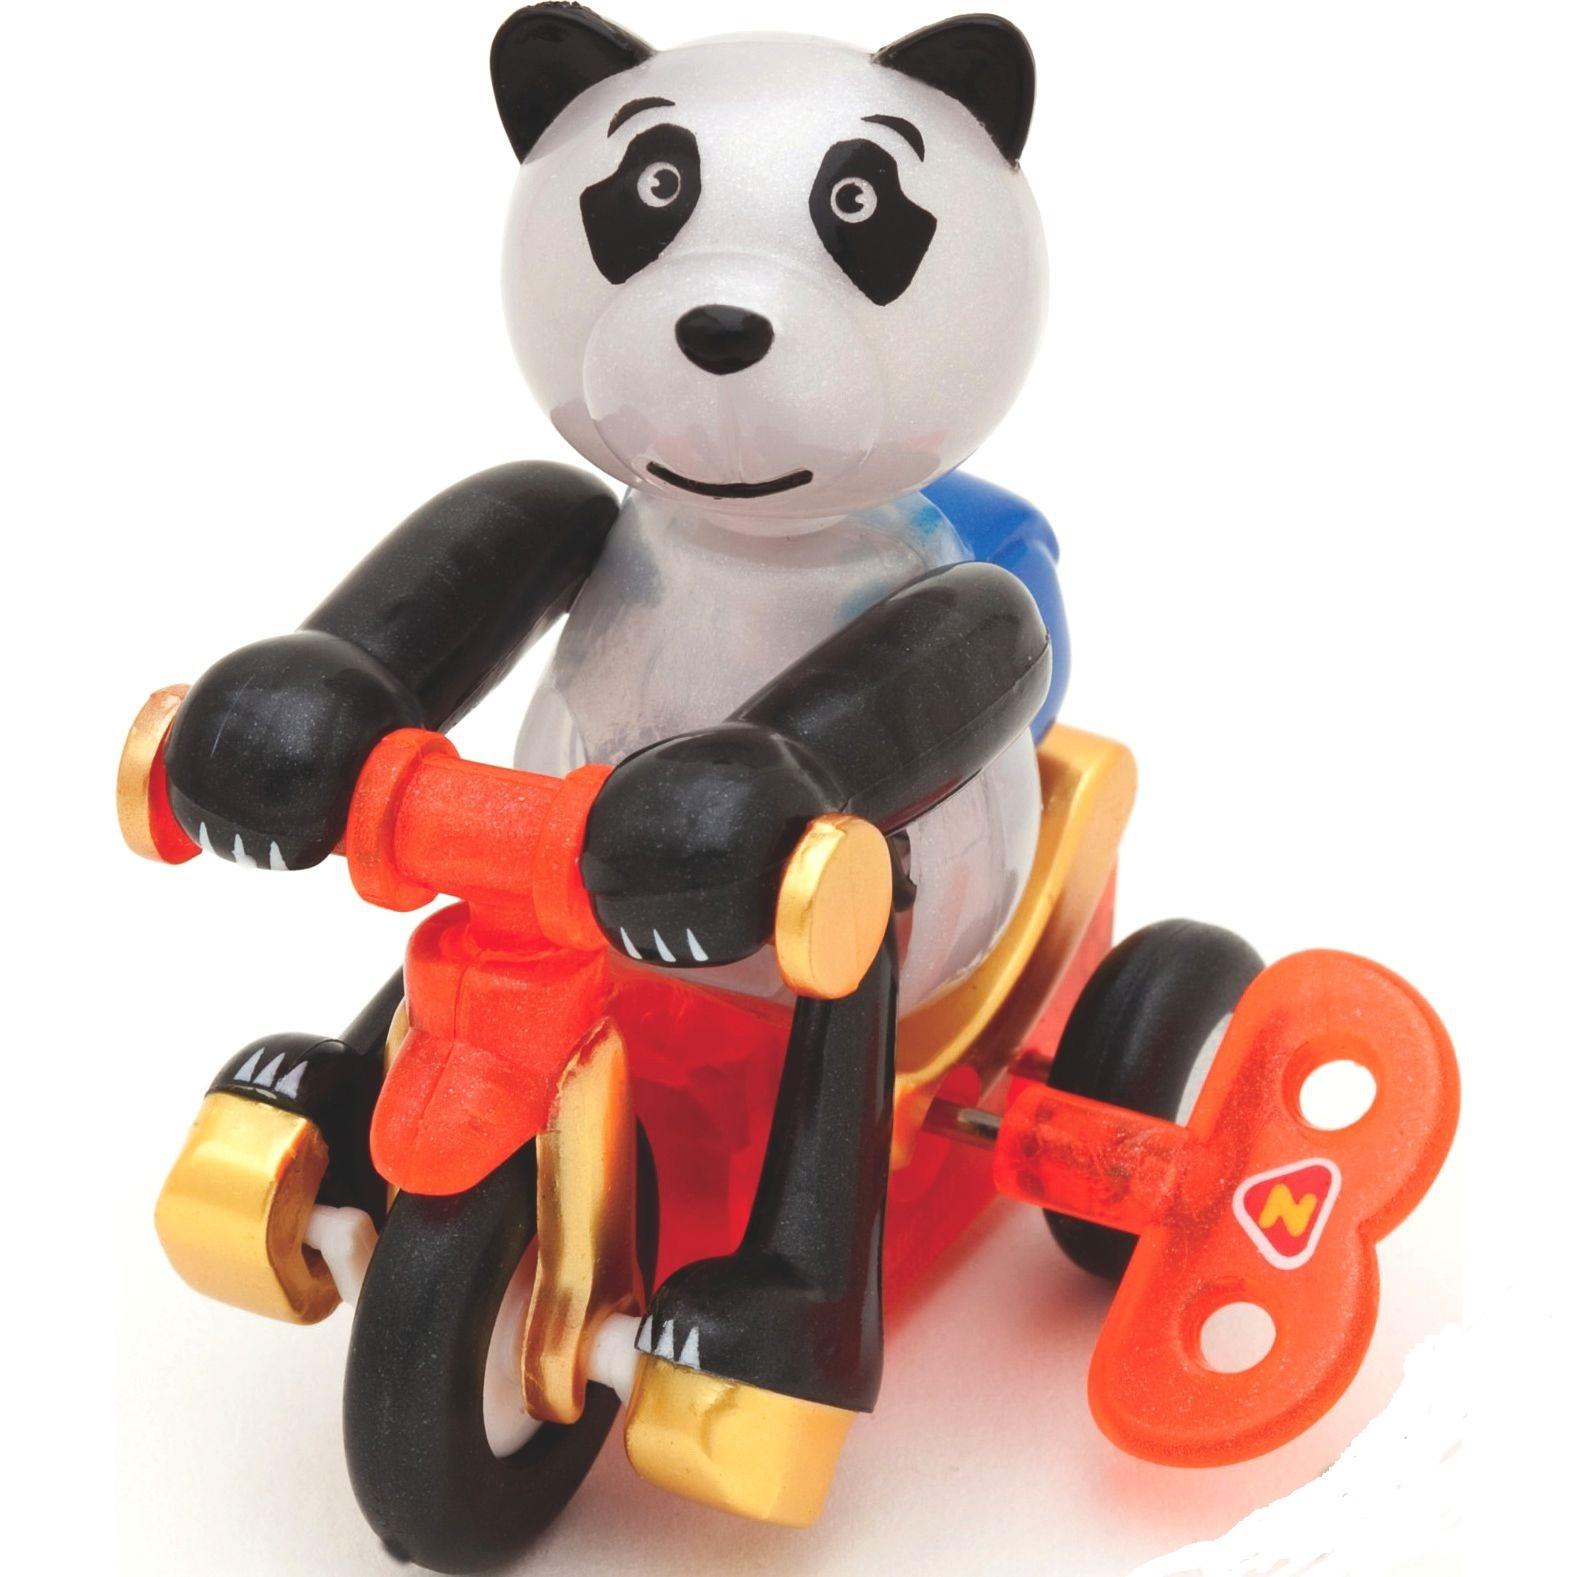 Cheap sex toy animal sexy soft minion toys, find sex toy animal sexy soft minion toys deals on line